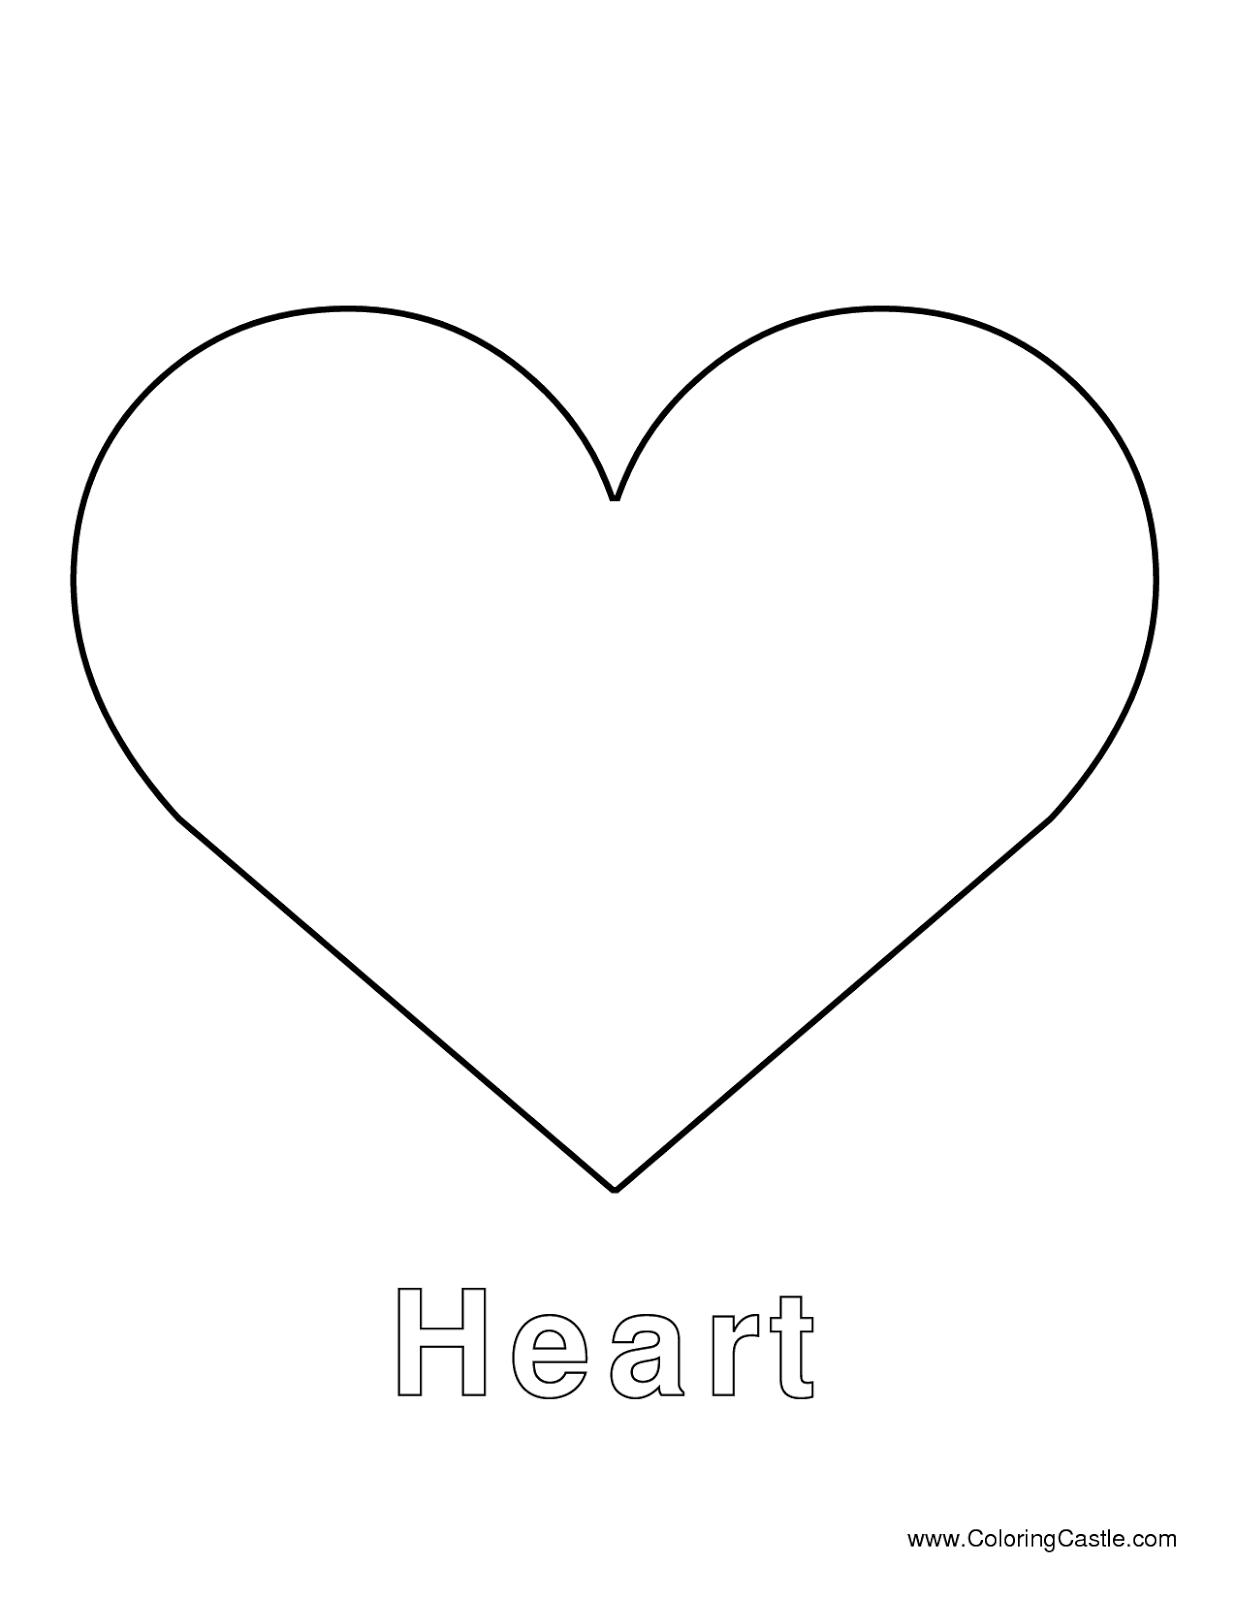 Cara Melipat/Membuat Amplop Bentuk Hati